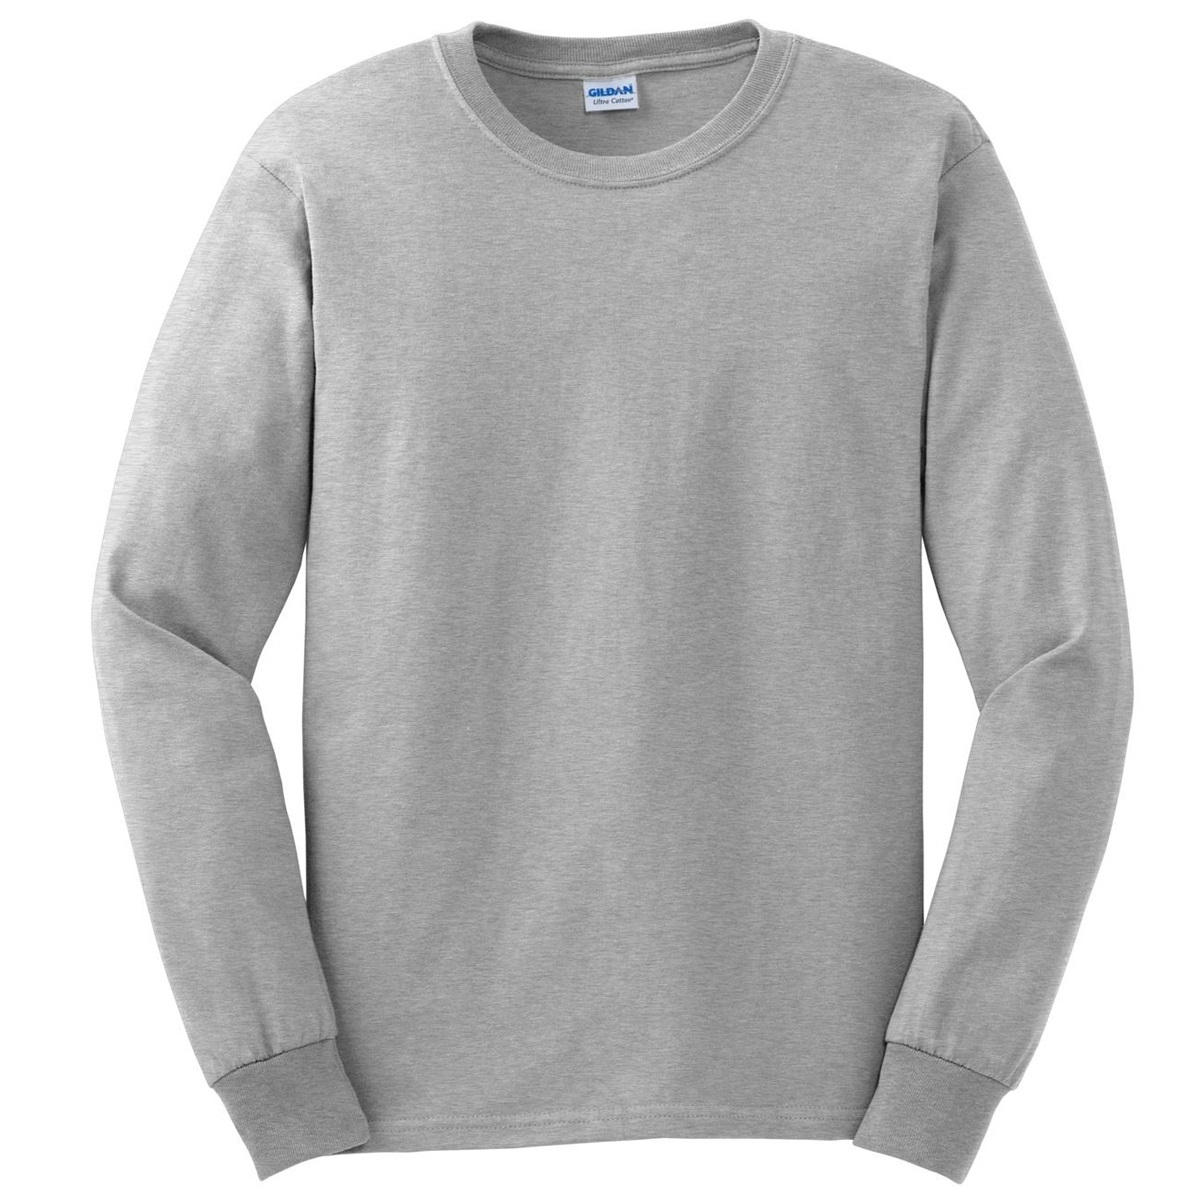 Gildan g2400 ultra cotton long sleeve t shirt ash for Grey long sleeve shirts